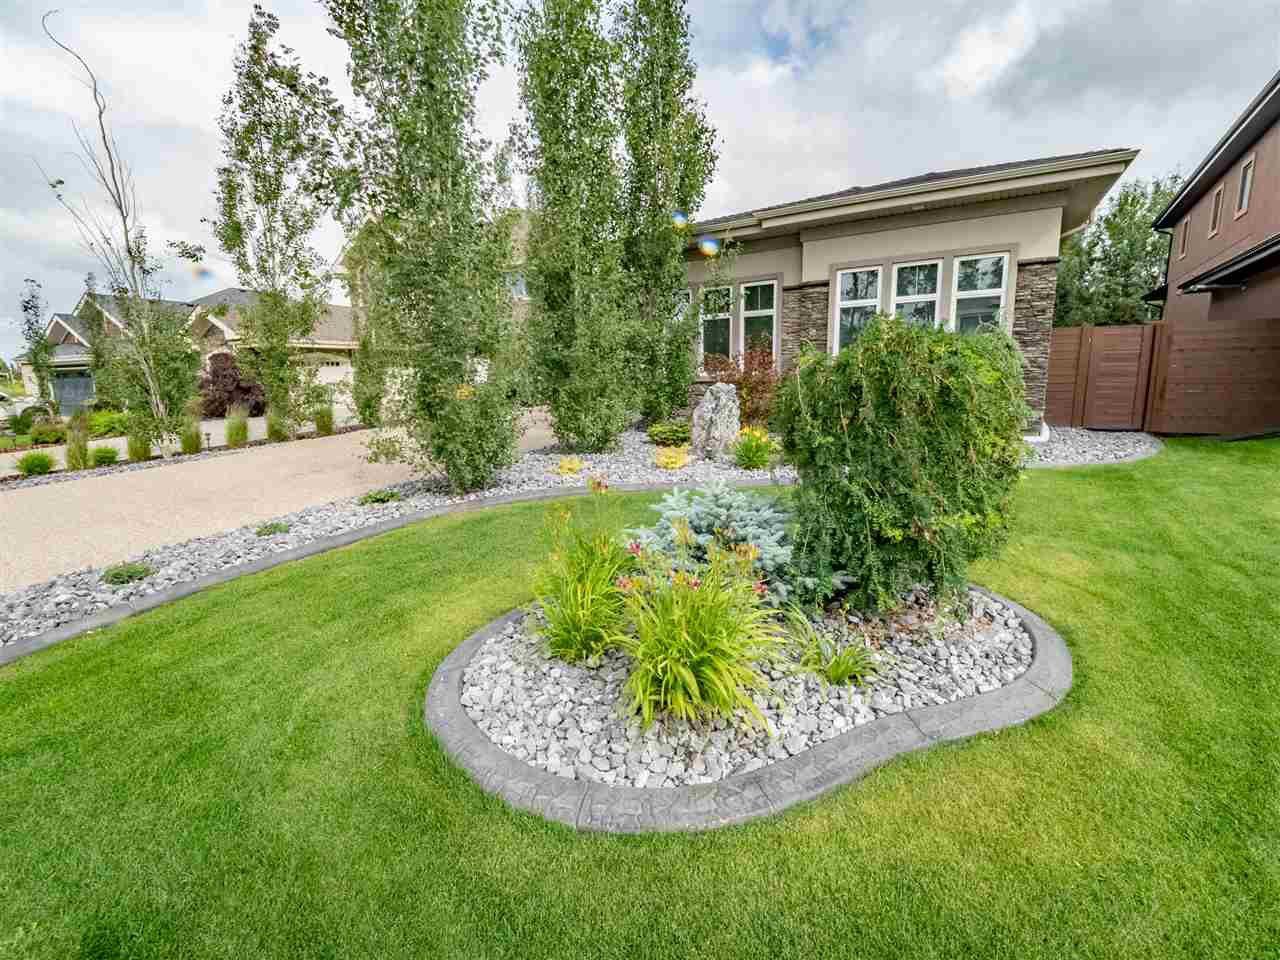 Photo 3: Photos: 58 Kenton Woods Lane NW: Spruce Grove House for sale : MLS®# E4166439